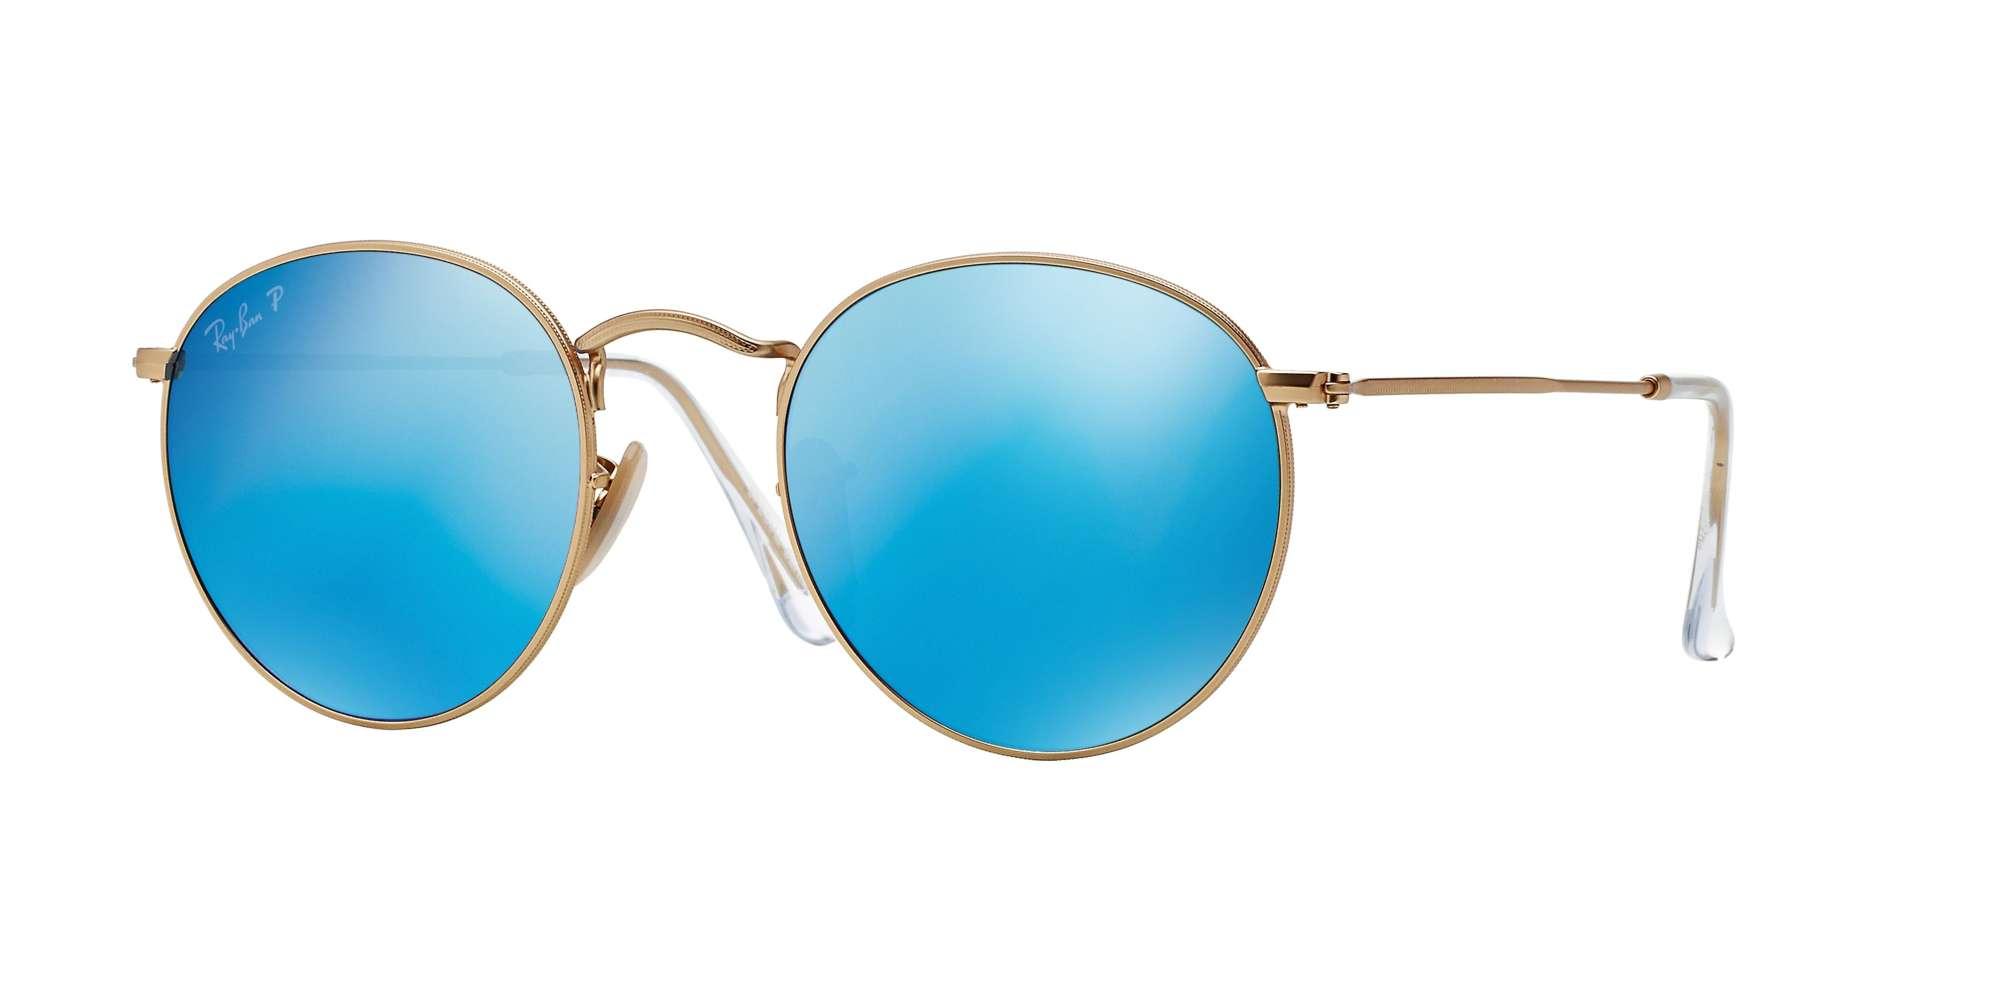 MATTE GOLD / BLUE MIRROR POLAR lenses